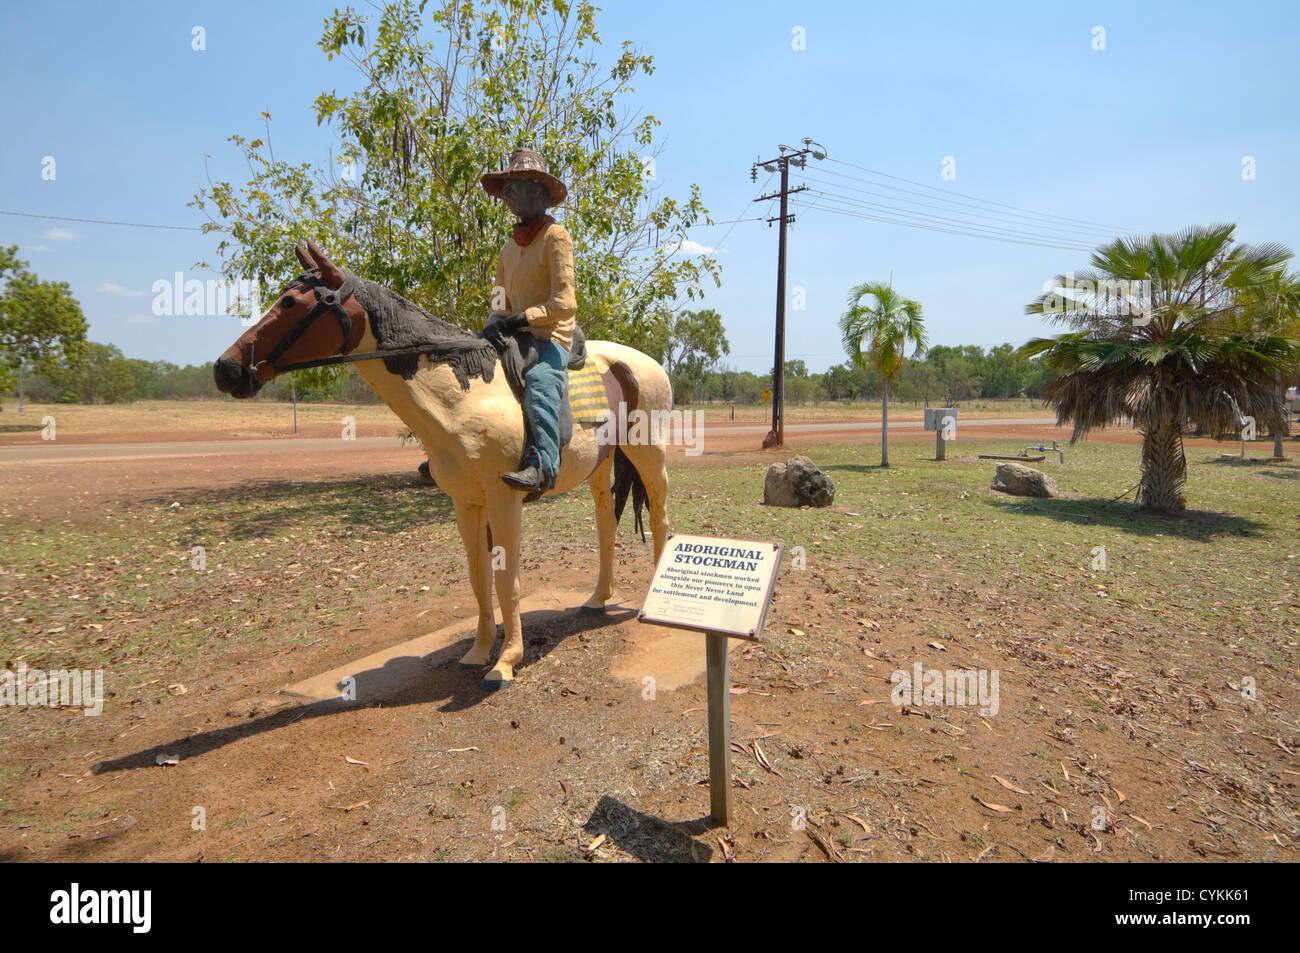 Statue of an Aboriginal Stockman, Mataranka, Northern Territory, Australia - Stock Image